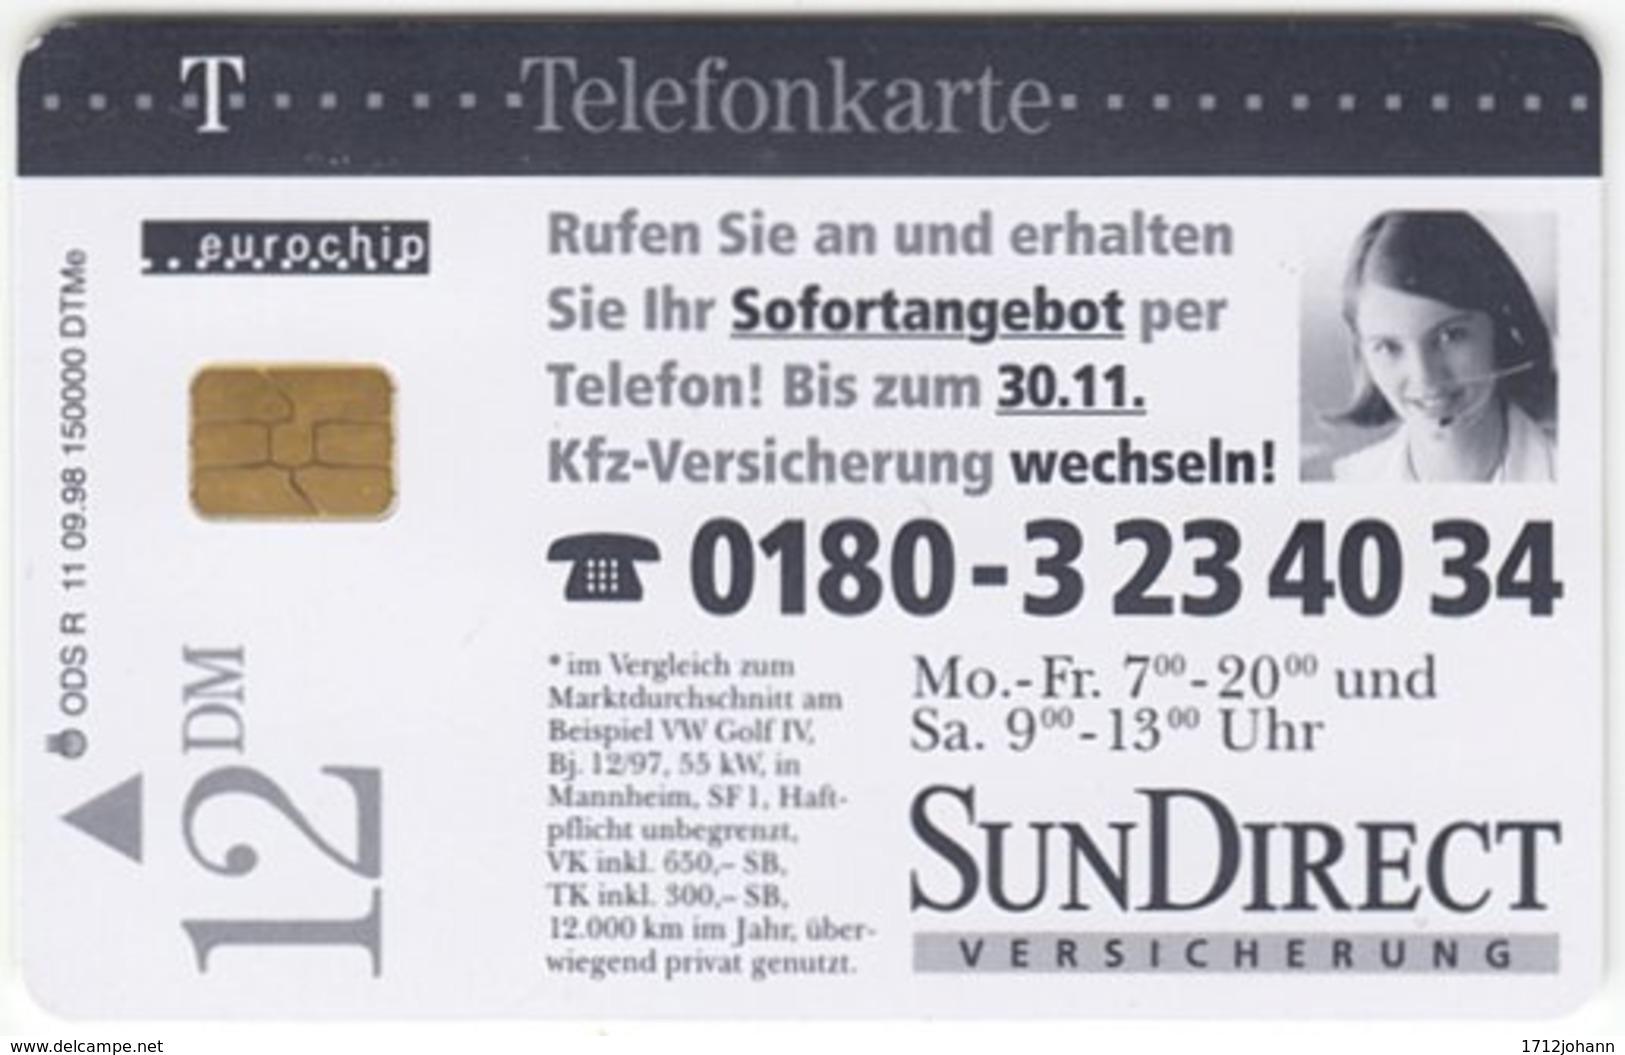 GERMANY R-Serie A-165 - 11 09.98 (2808) - Advertising, Magazine - Used - R-Series: Regionale Schalterserie